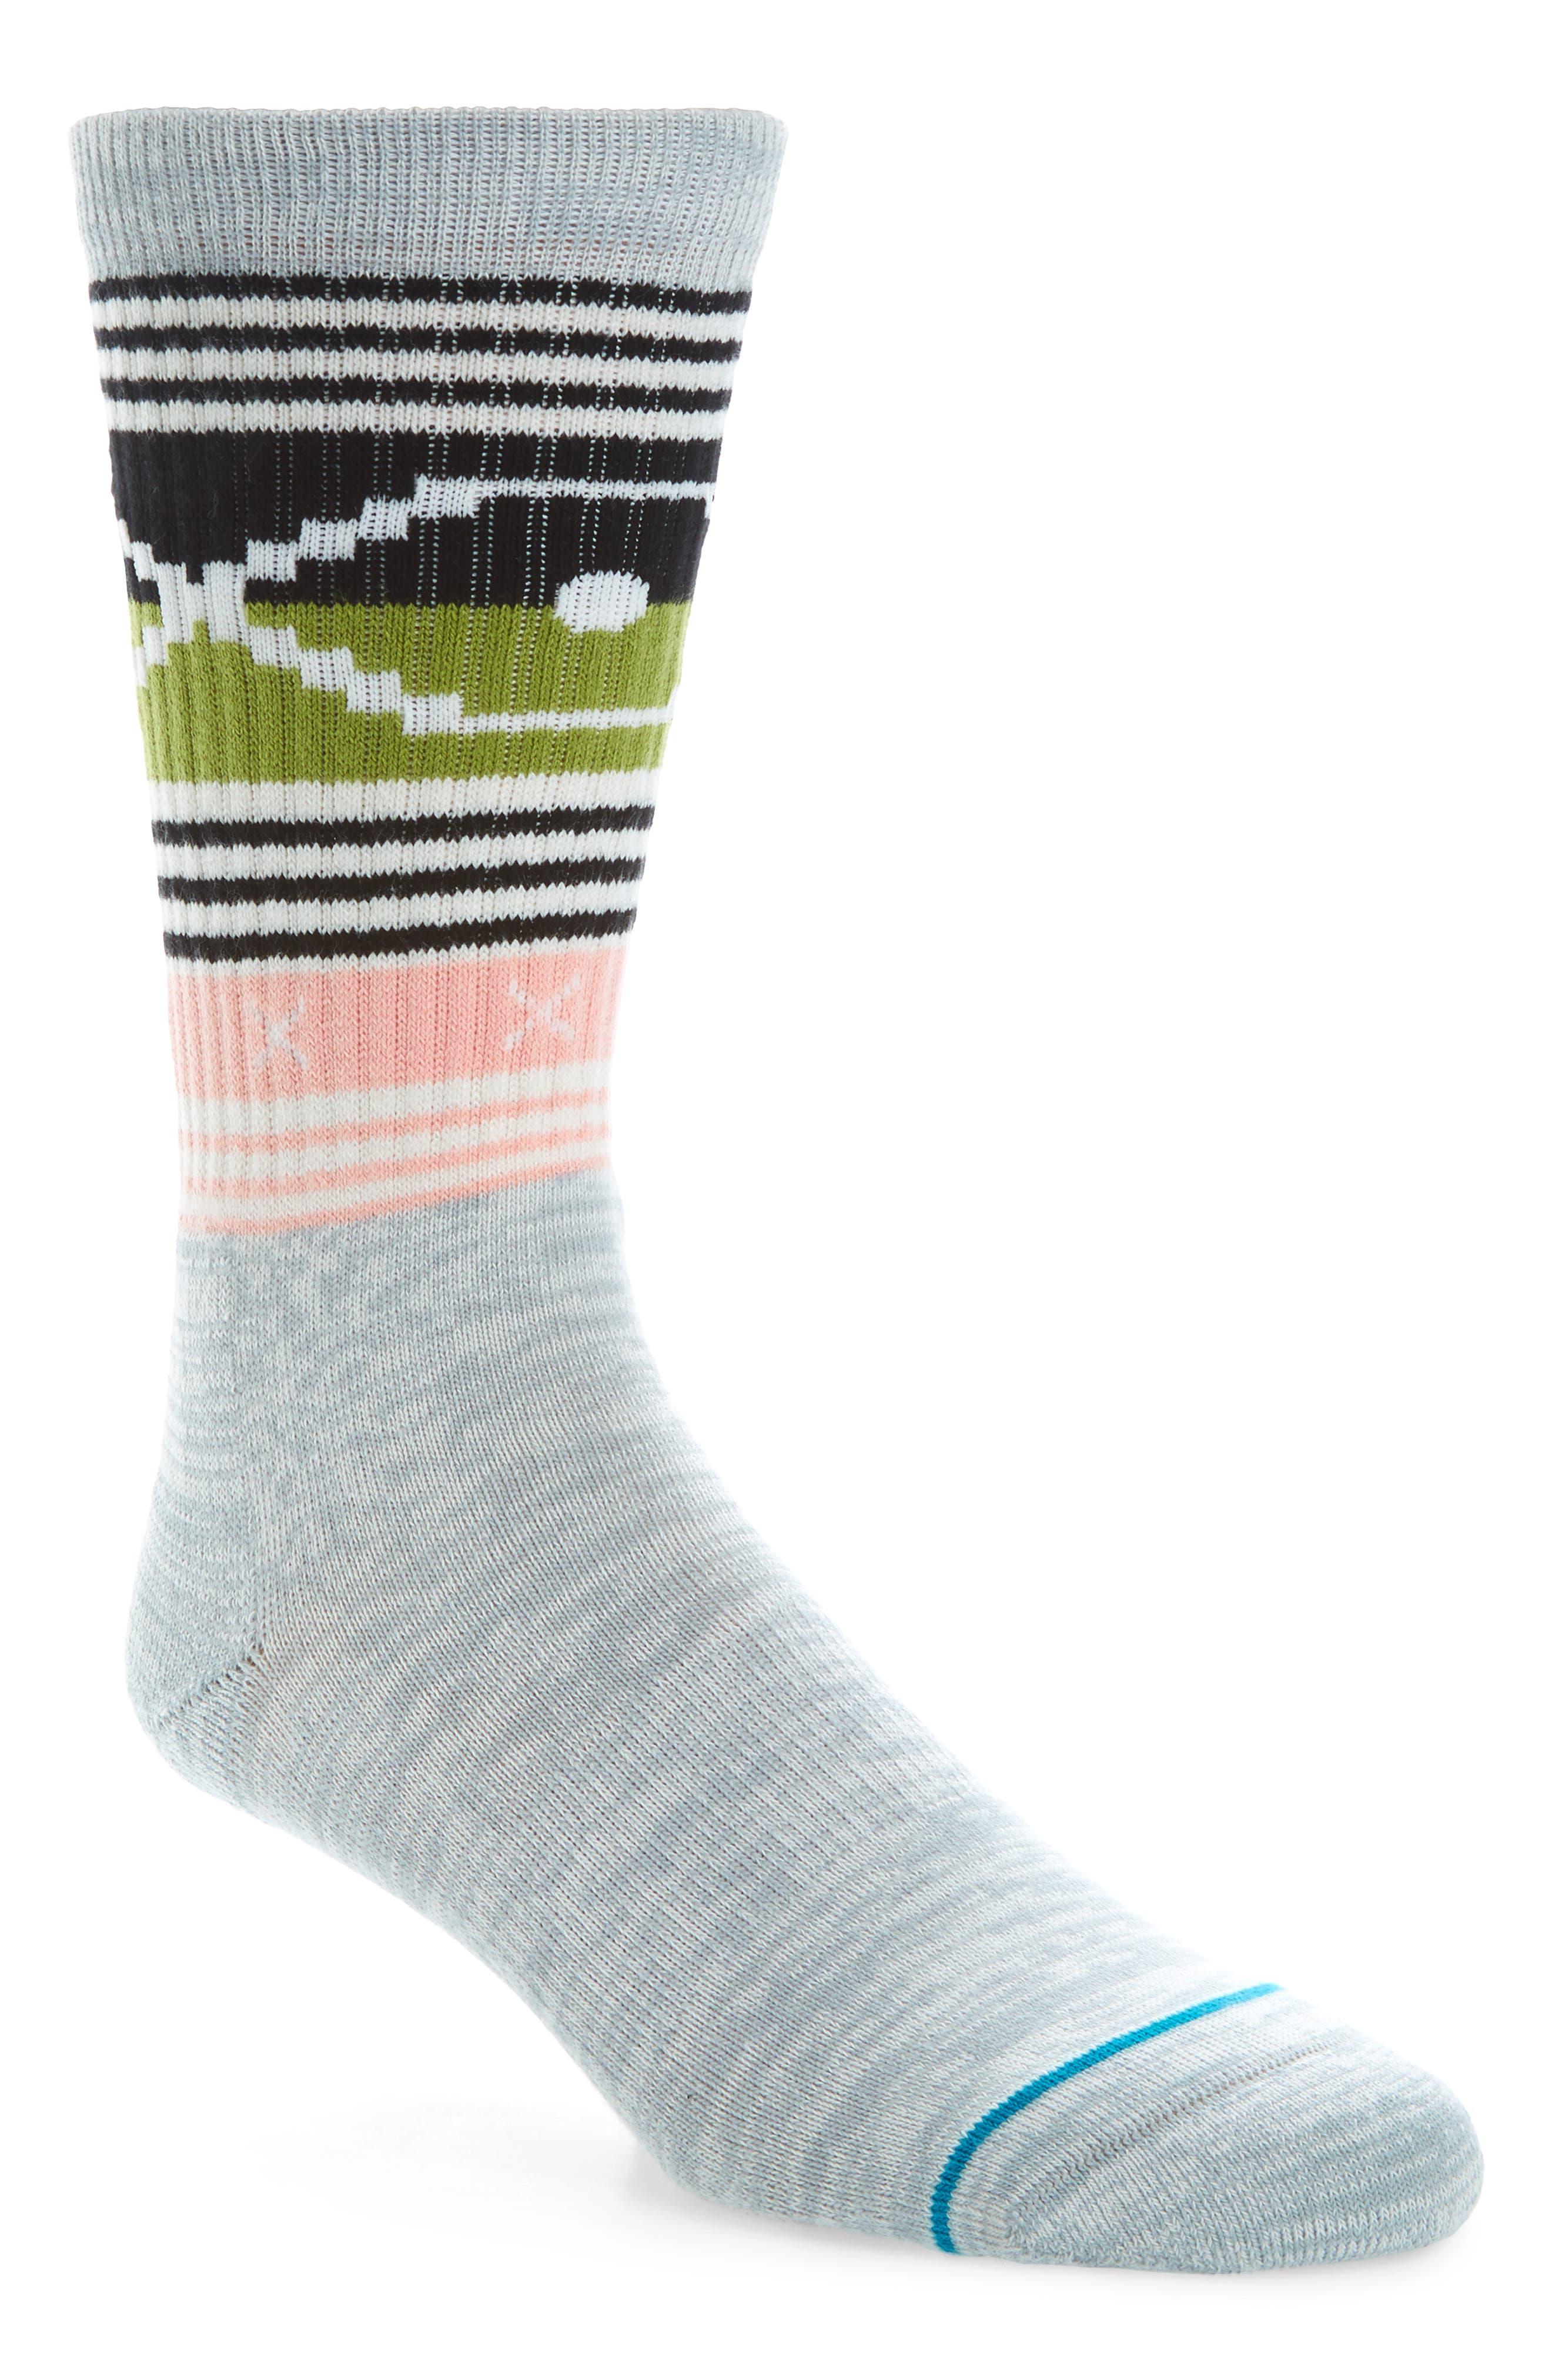 Harries Crew Socks,                             Main thumbnail 1, color,                             Grey